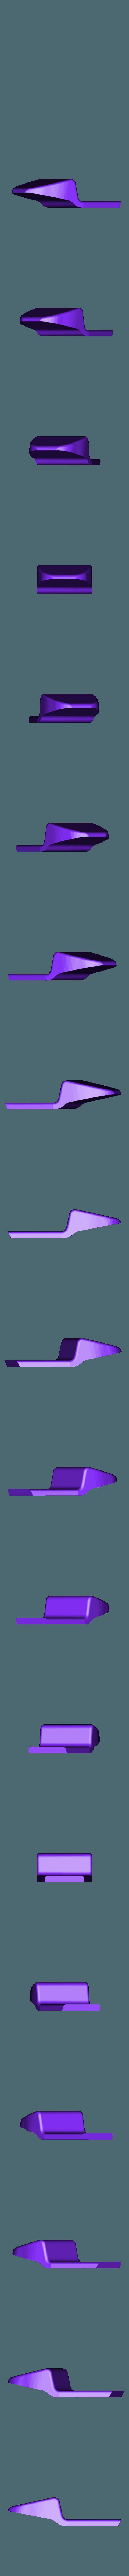 Seat.STL Download STL file Cafe racer • Model to 3D print, Guillaume_975